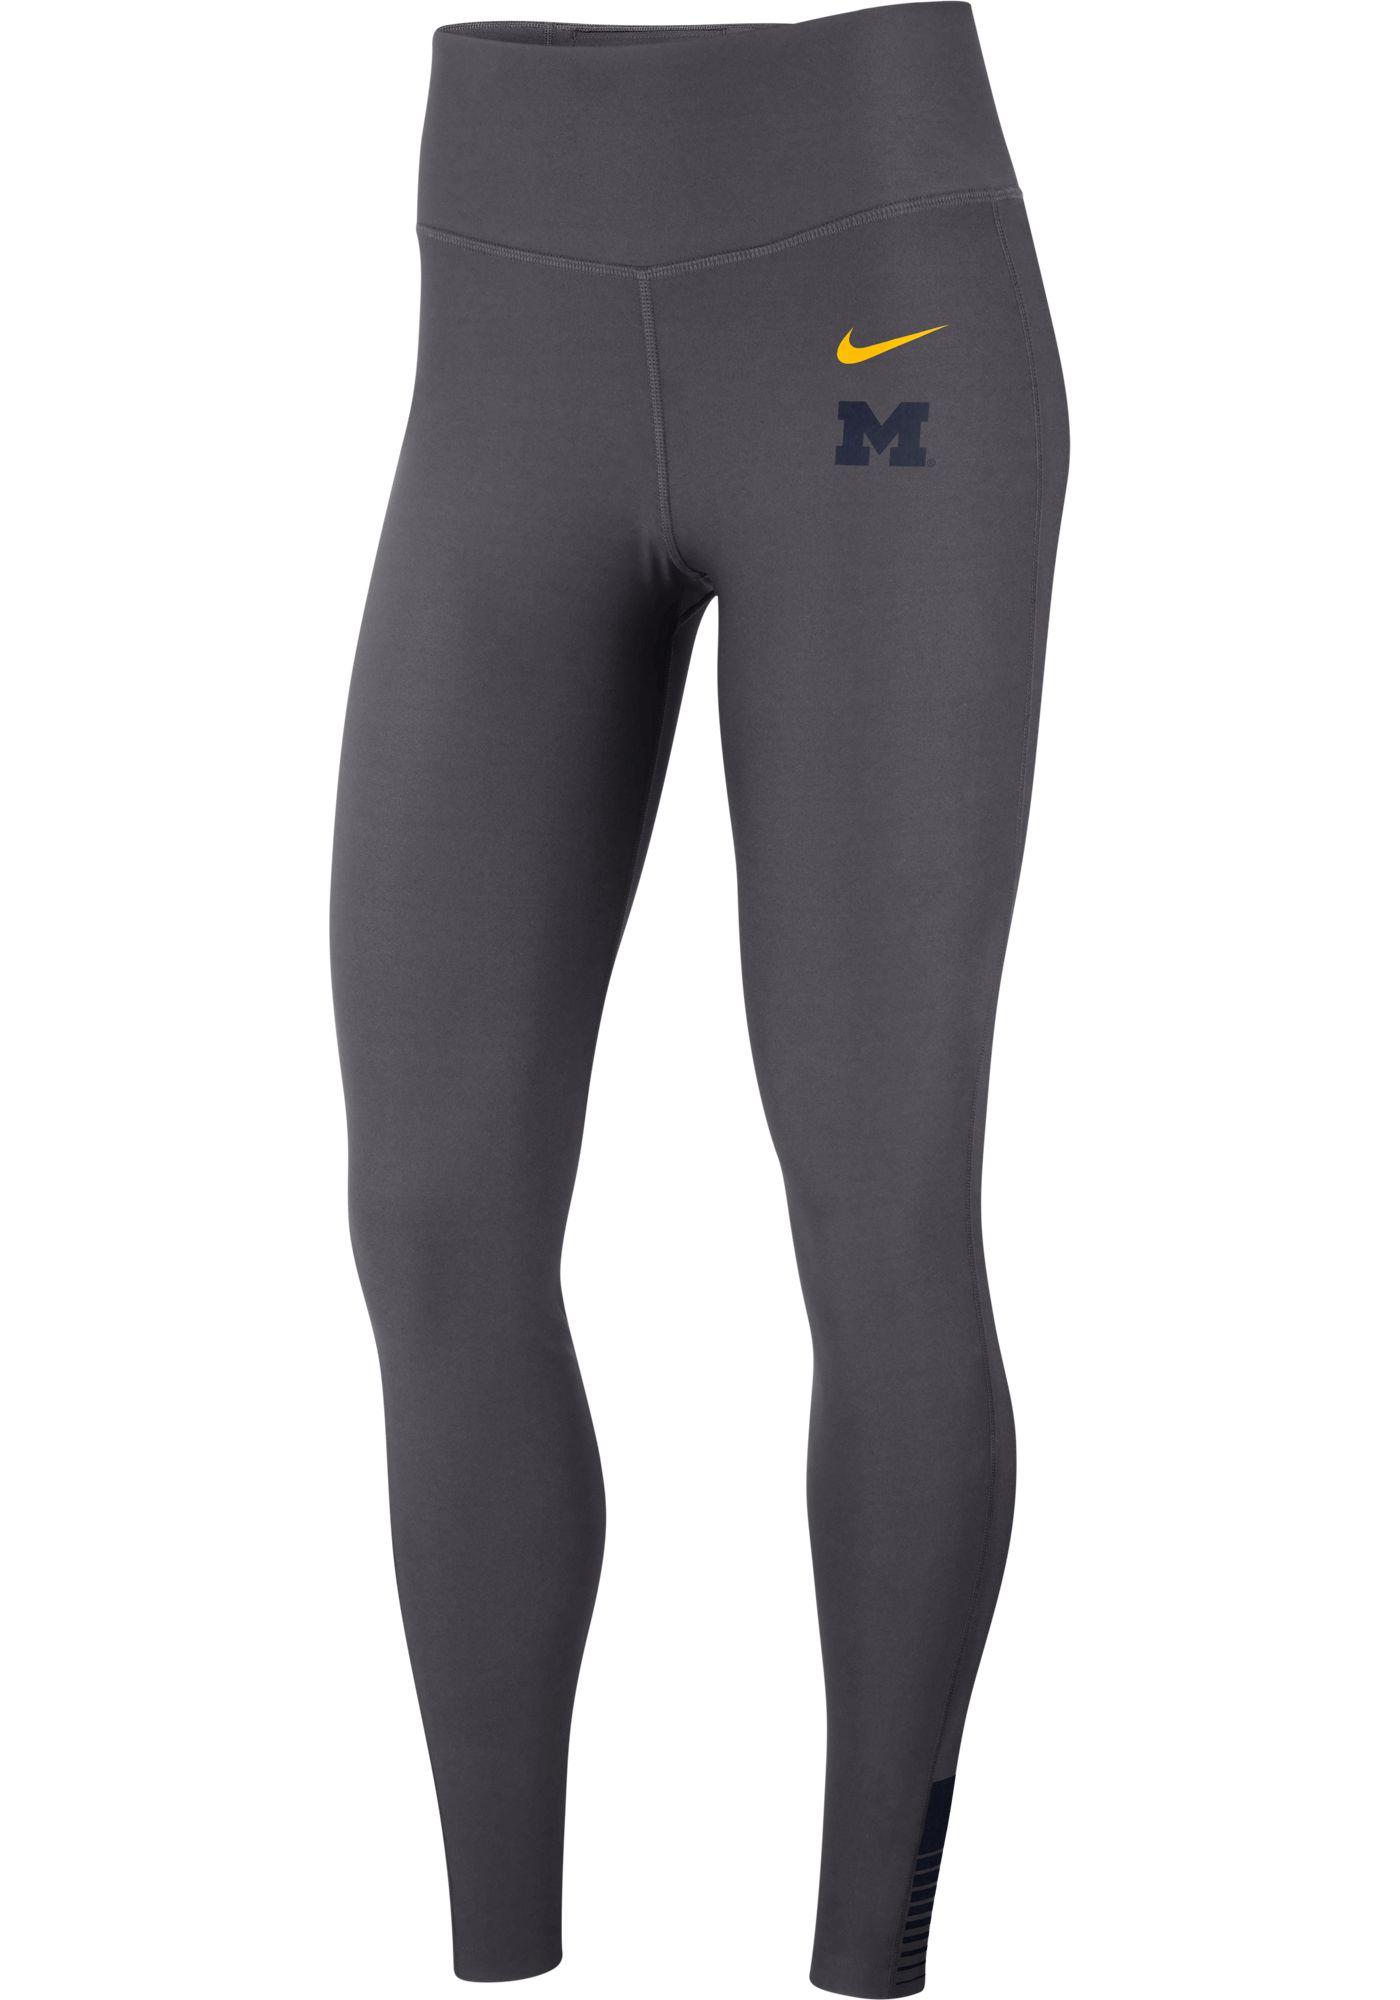 Nike Women's Michigan Wolverines Grey Power Sculpt High Rise Training Tights